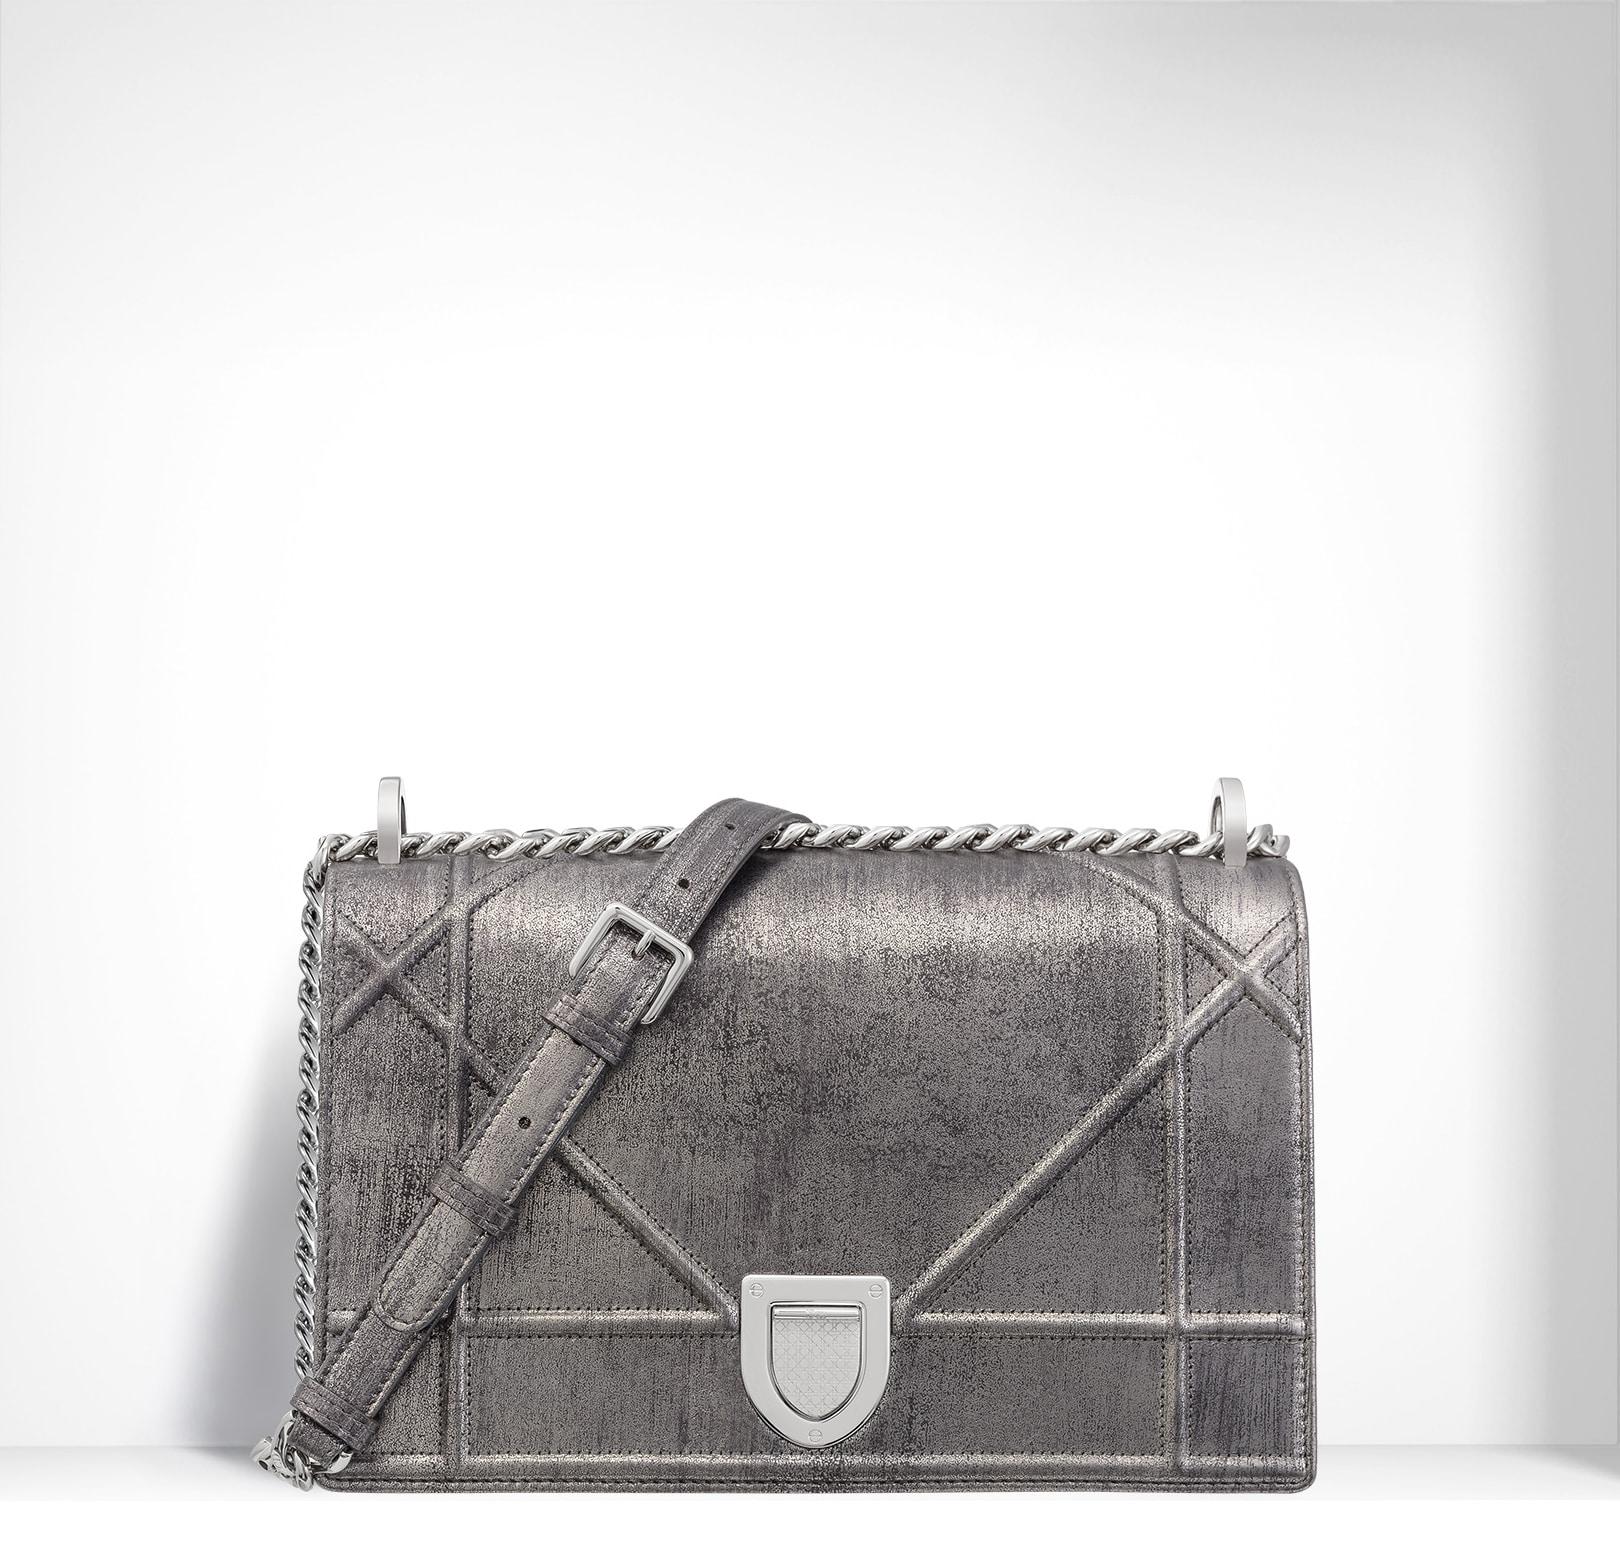 Dior Titanium Metallic and Brushed Calfskin Diorama Bag · Dior Silver-Tone  Graded ... fab642b214442